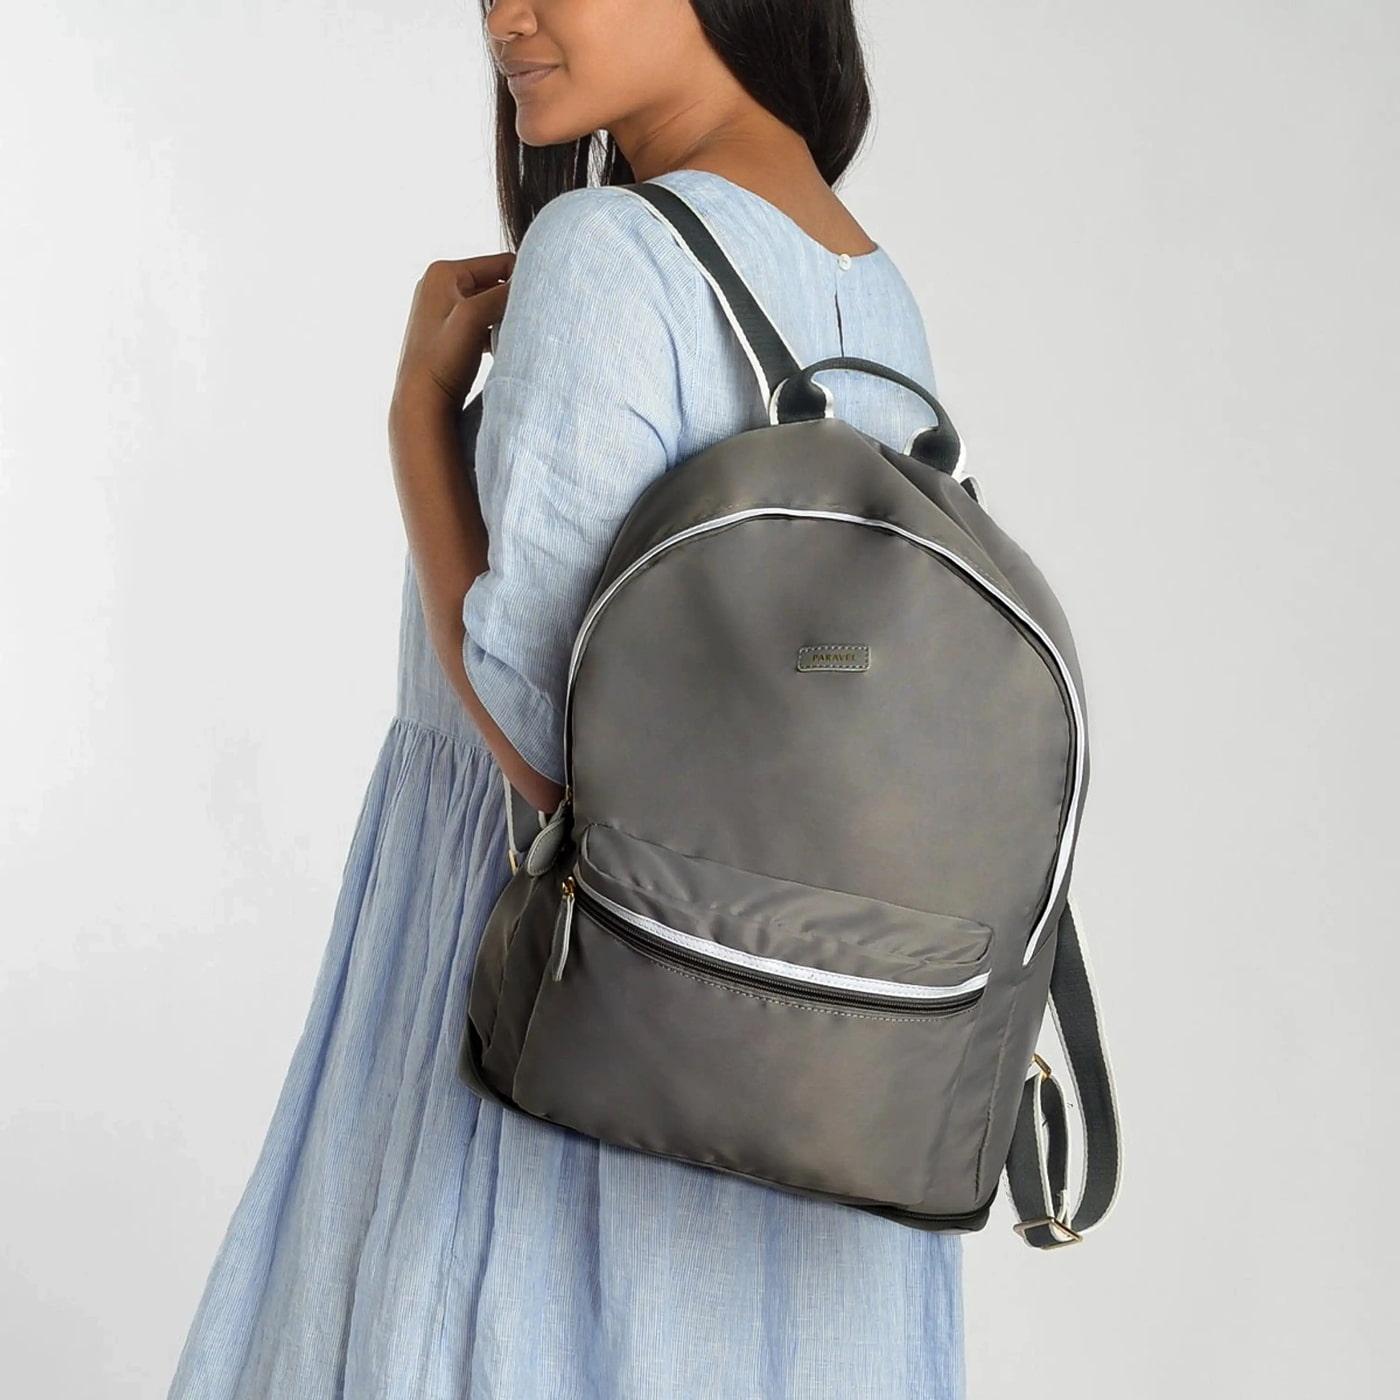 Best Lightweight Backpack for Women